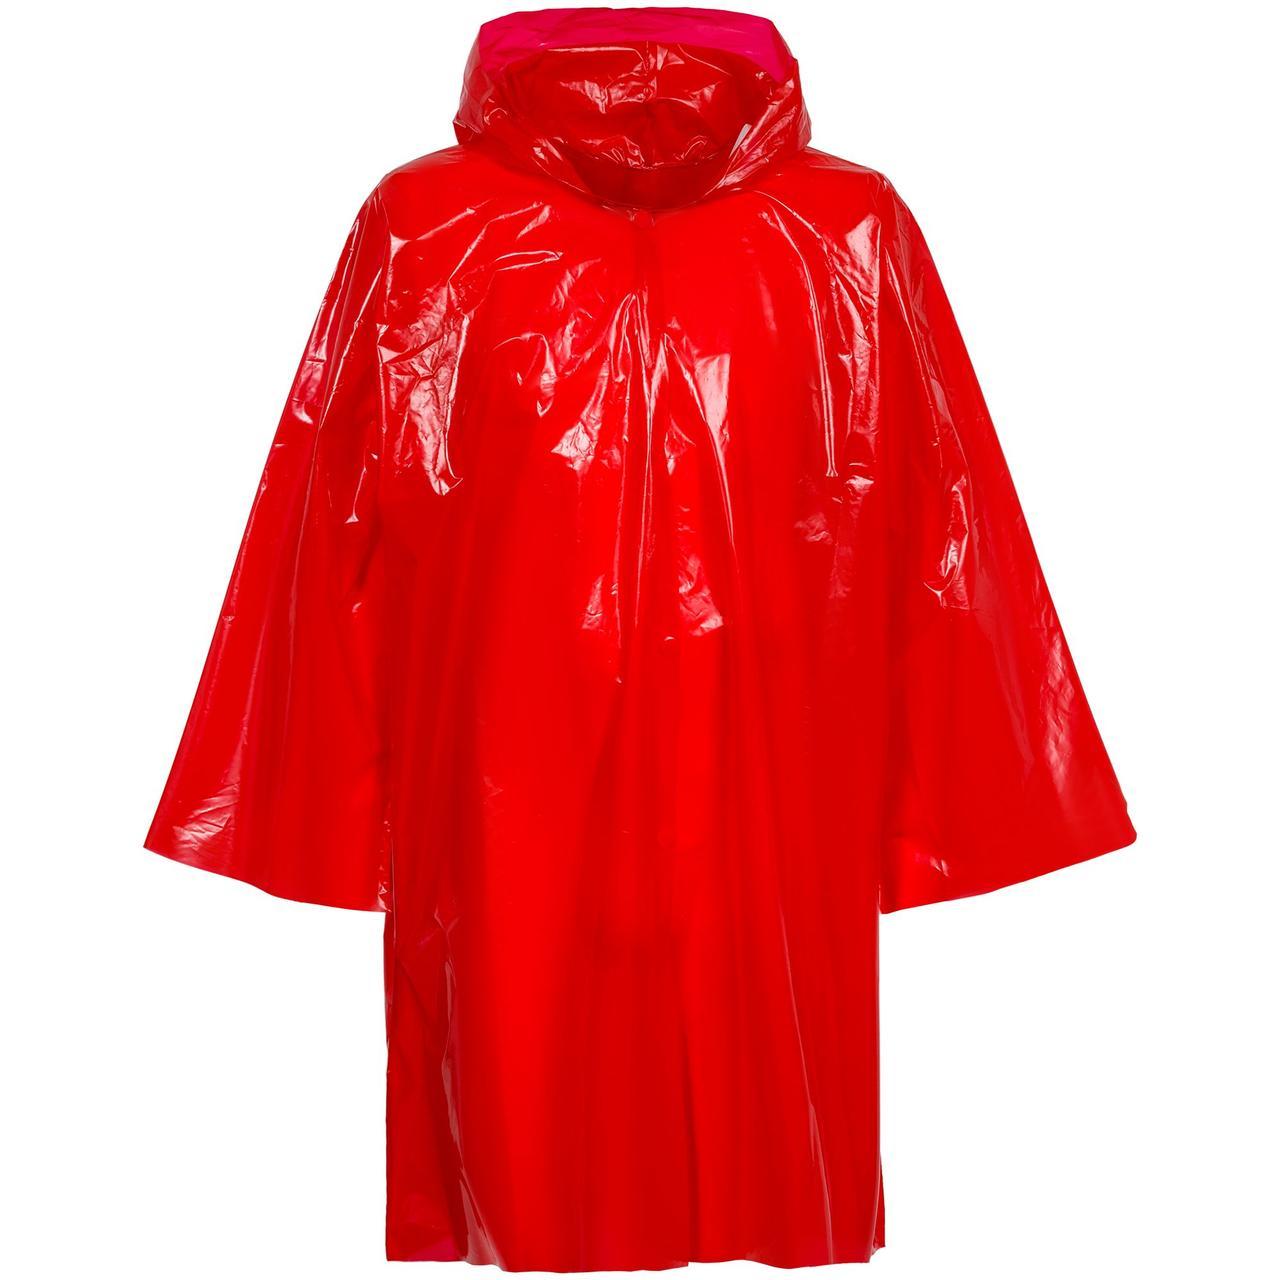 Дождевик-плащ CloudTime, красный (артикул 11876.50)